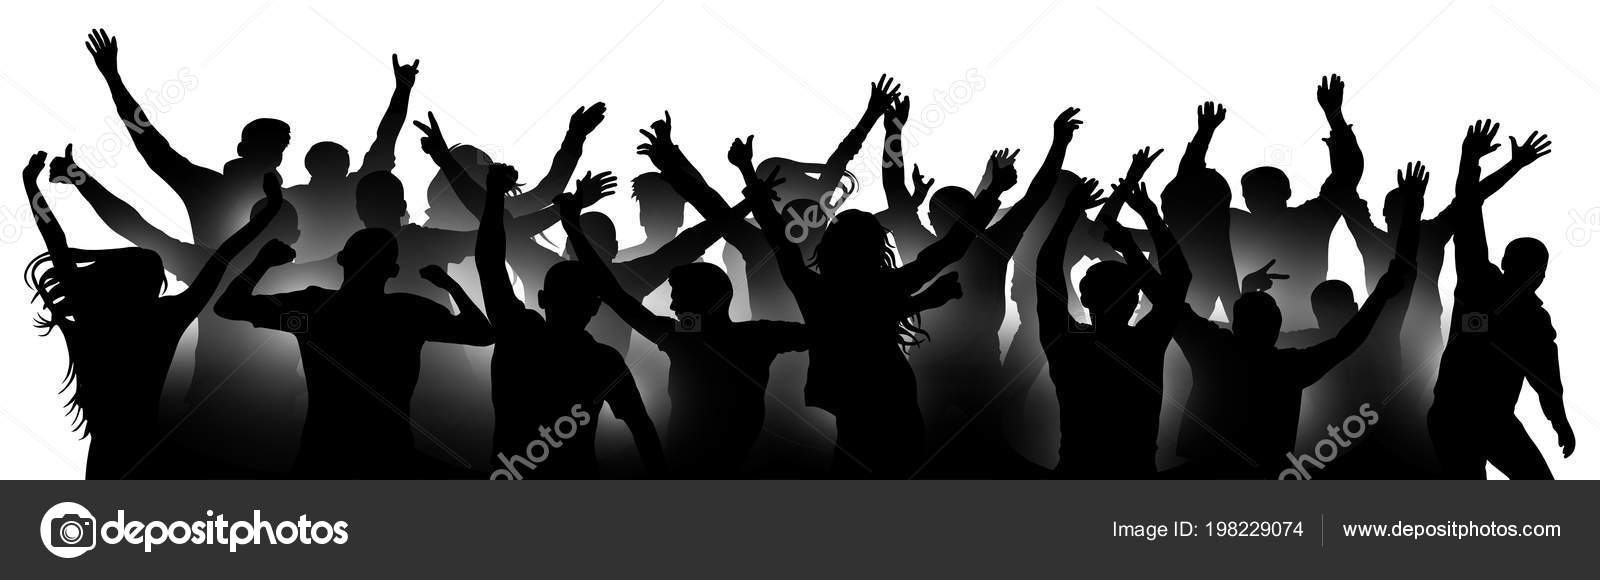 Multitud De Gente Silueta: Multitud Gente Alegre Aplaudiendo Silueta Fiesta Aplausos